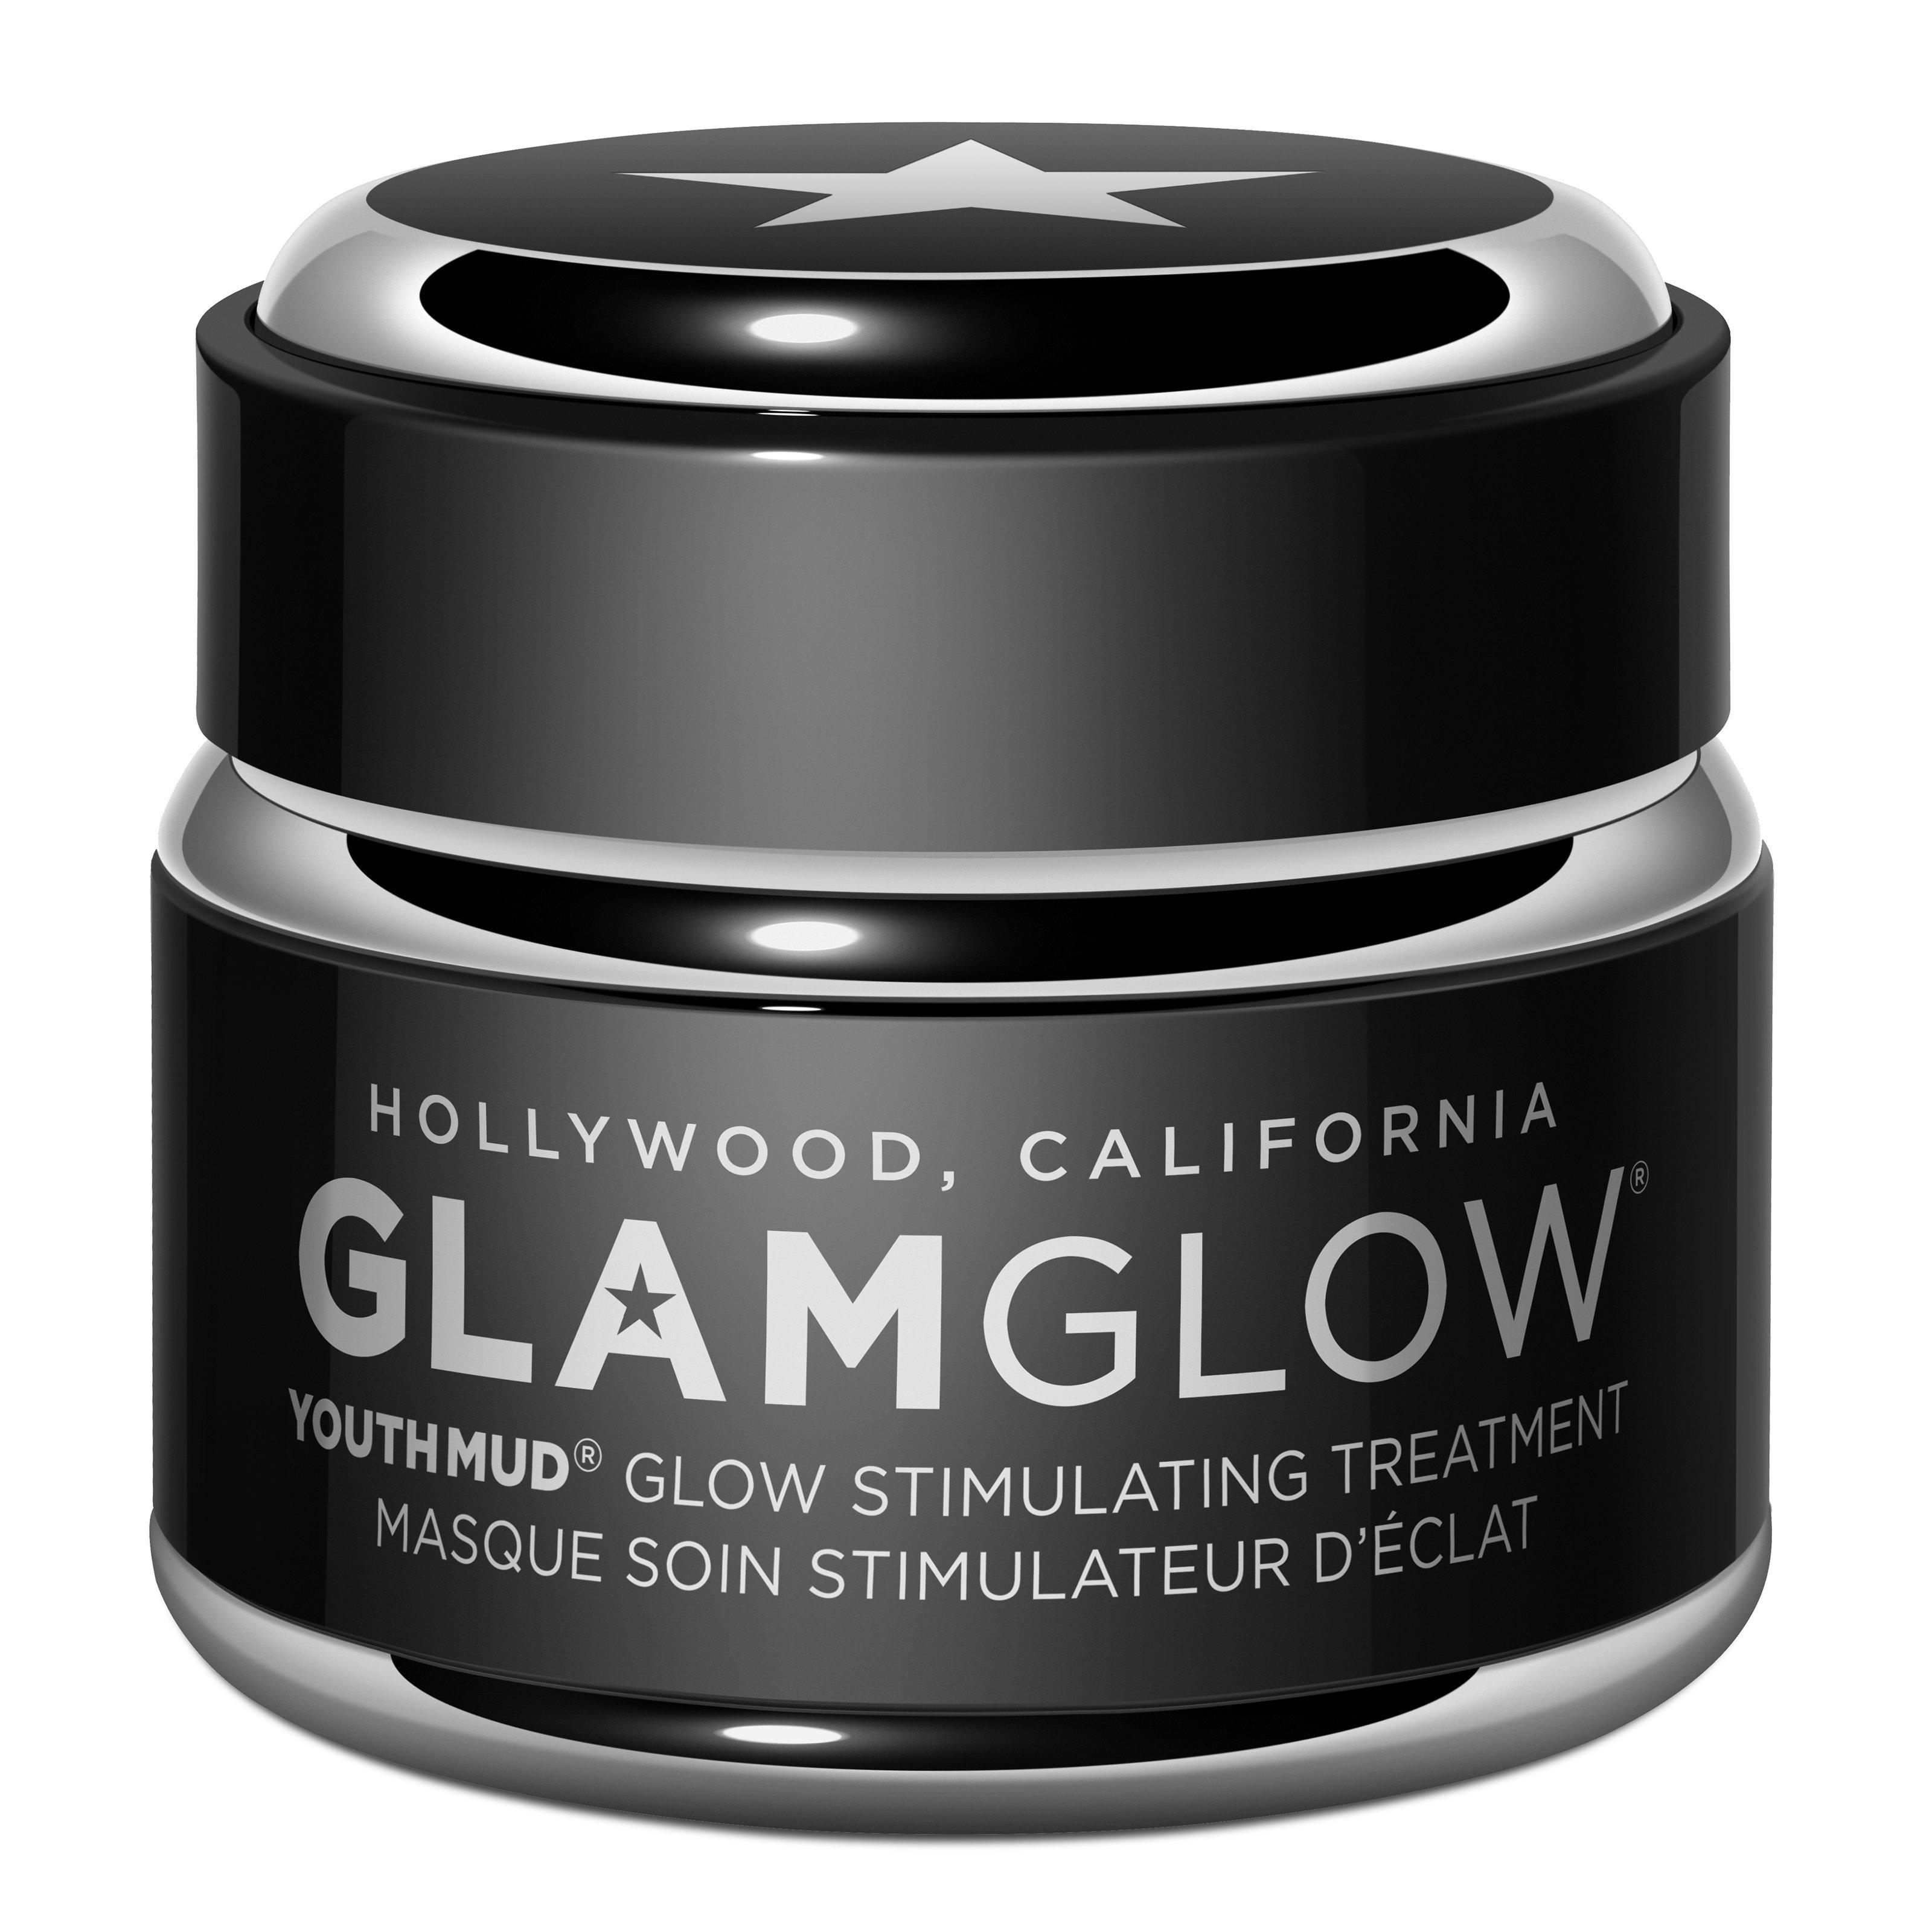 Glamglow Youthmud Glow Stimulating Treatment Mask Μάσκα Απολέπισης και Λάμψης 50gr